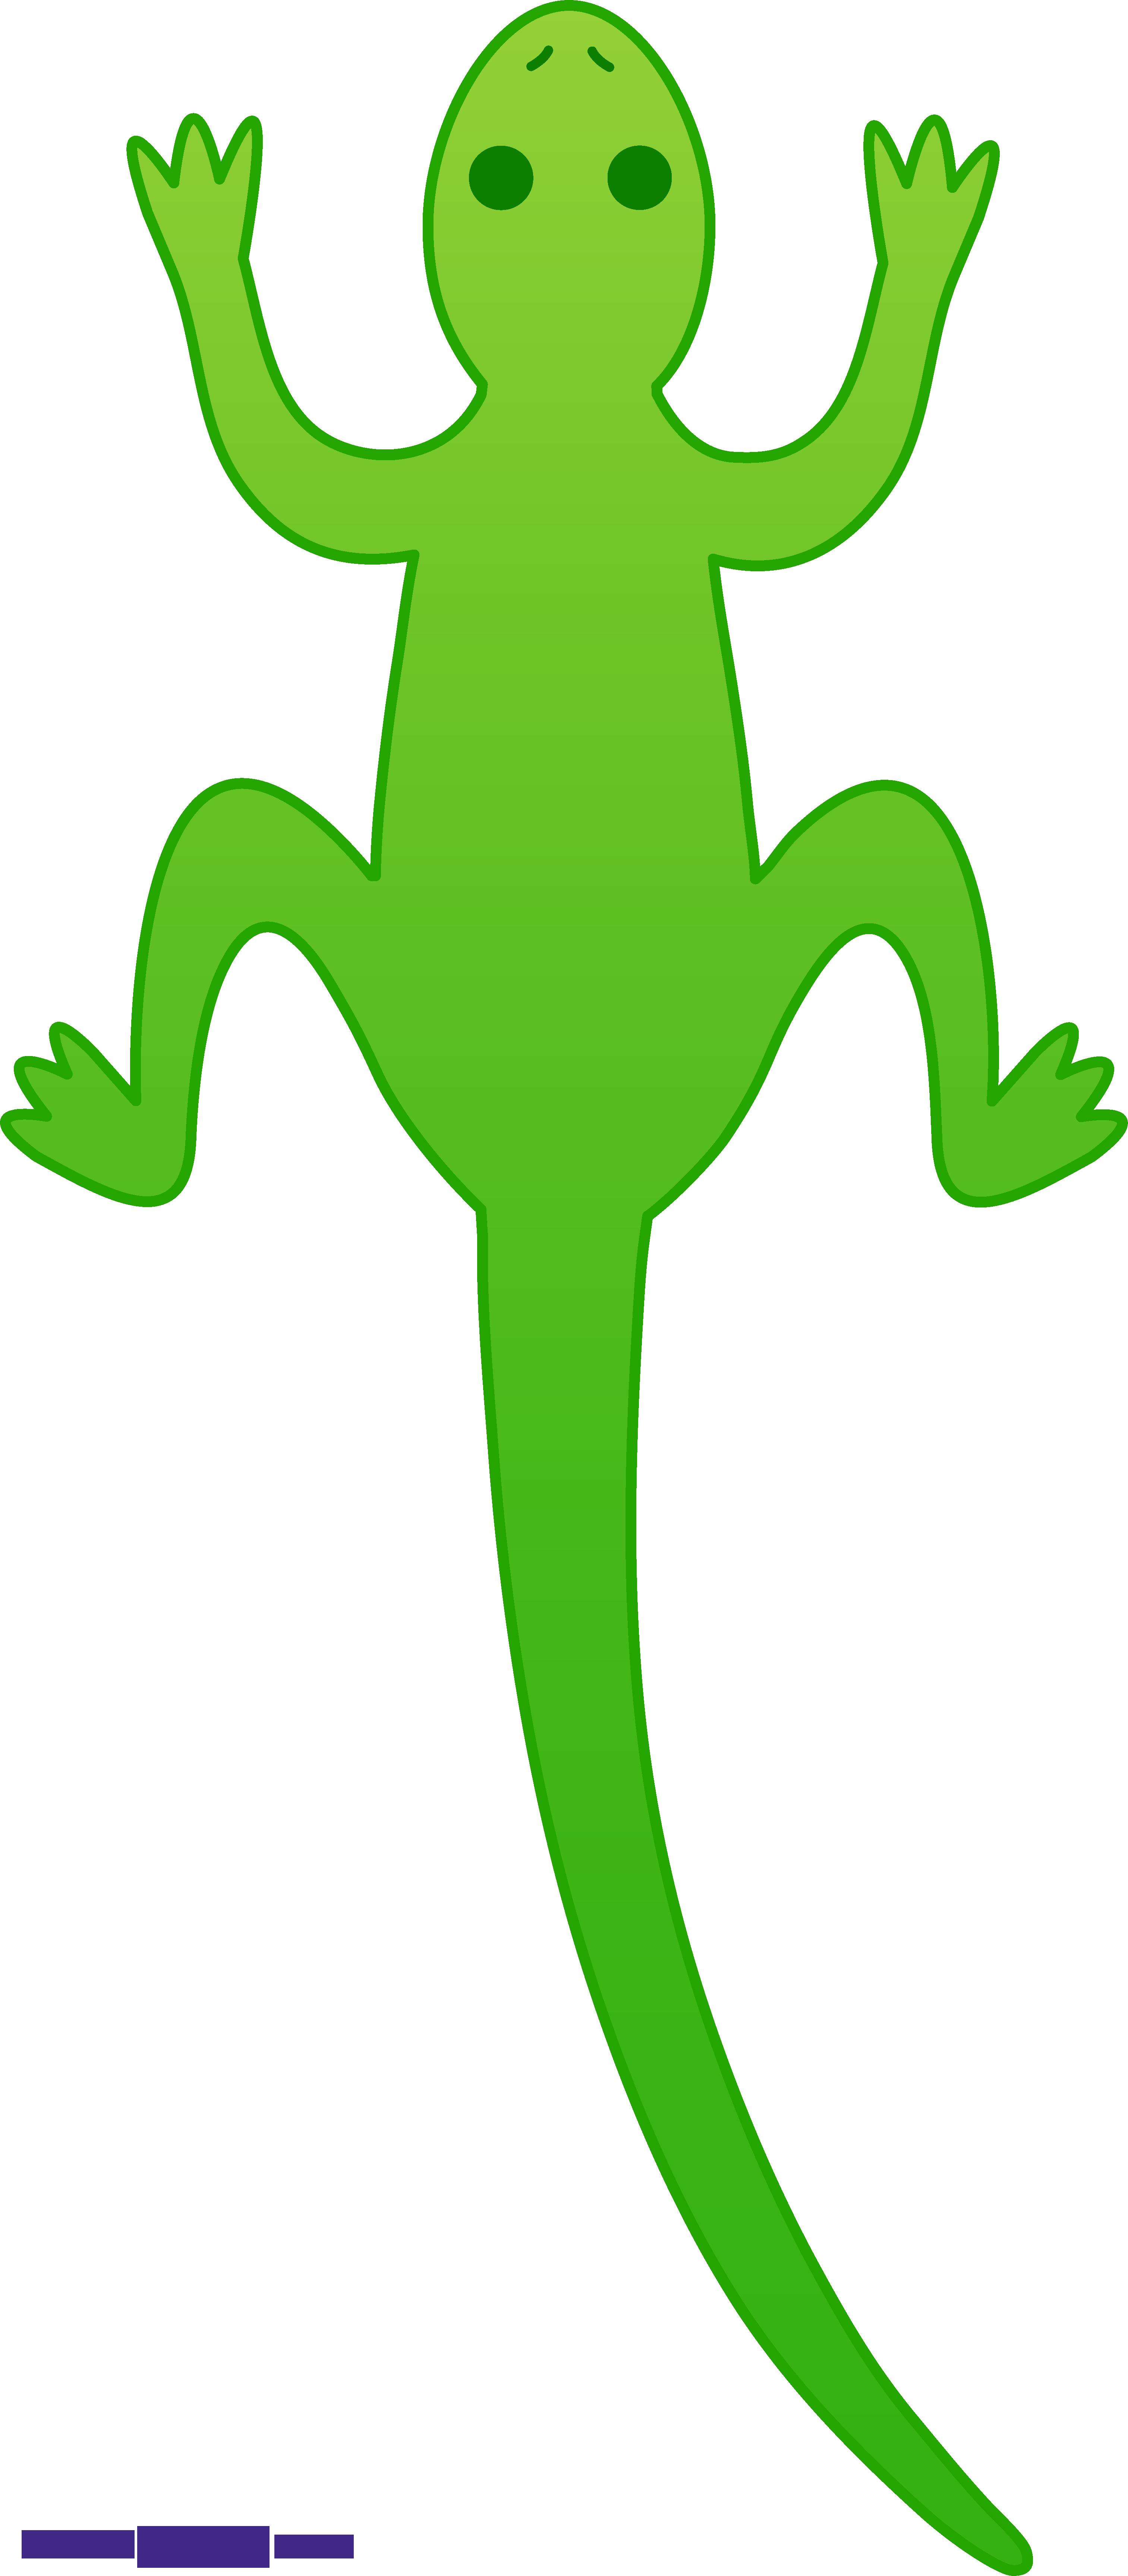 lizard green clipart sweet clip art rh m sweetclipart com lizard clip art free small lizard clipart black and white